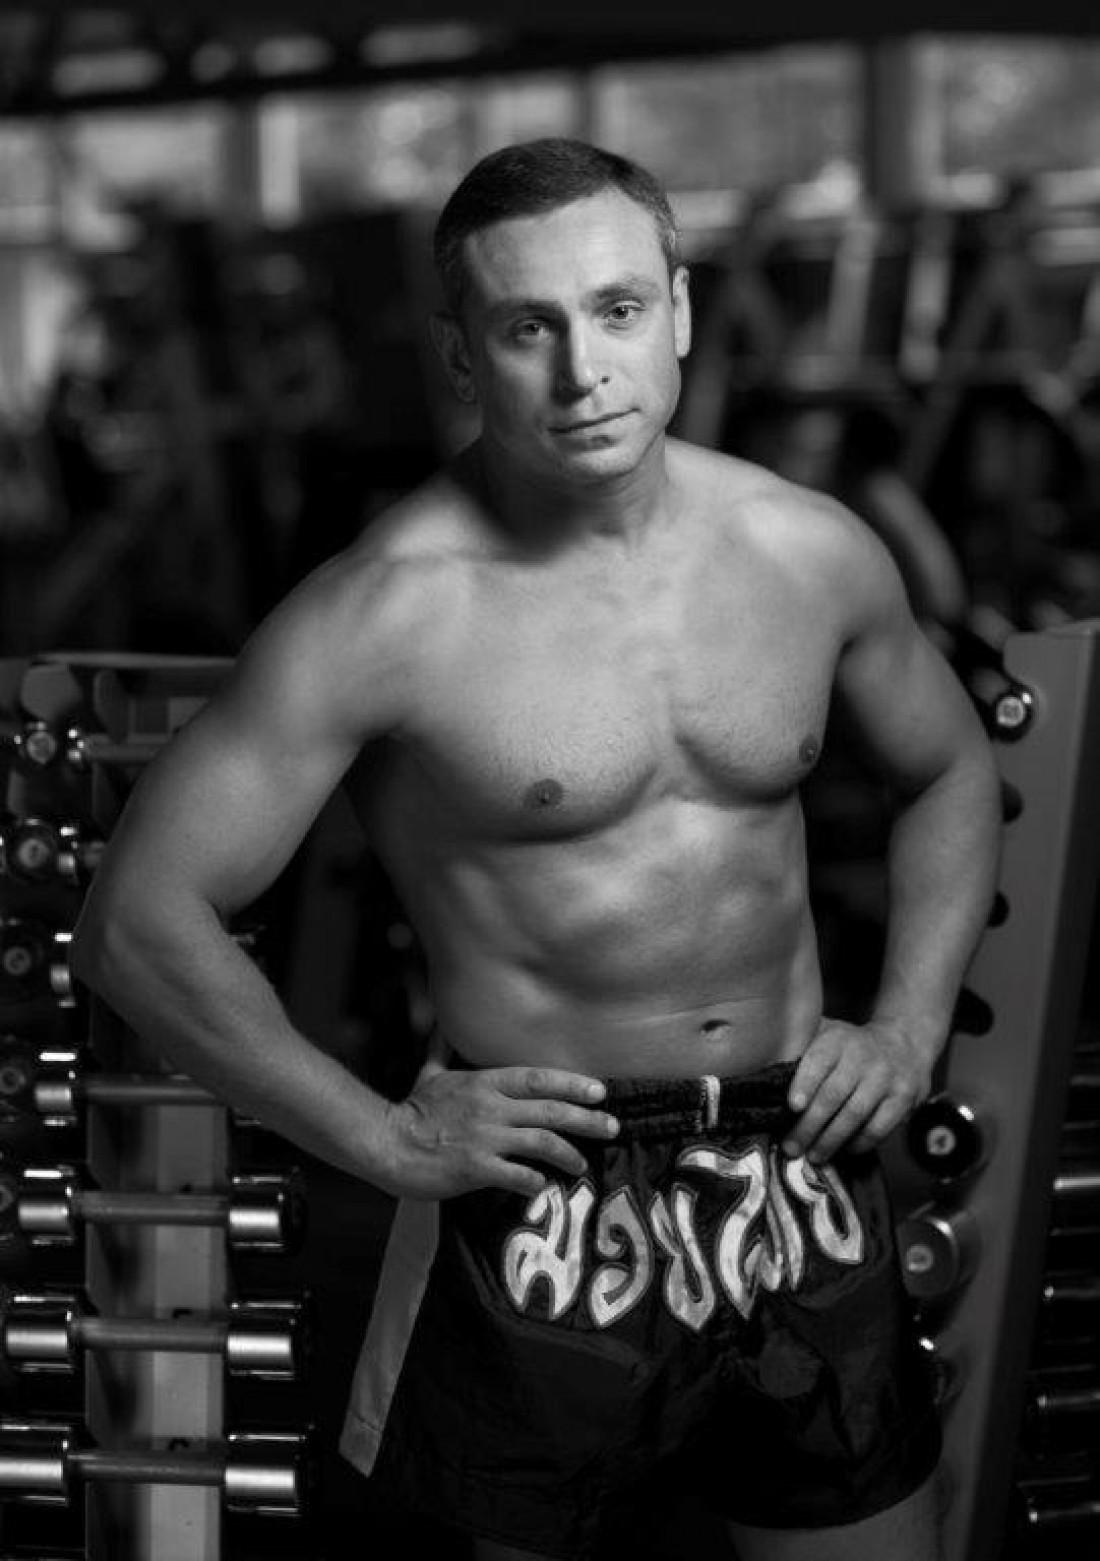 Рыбачок Роман, тренер BodyArt fitness